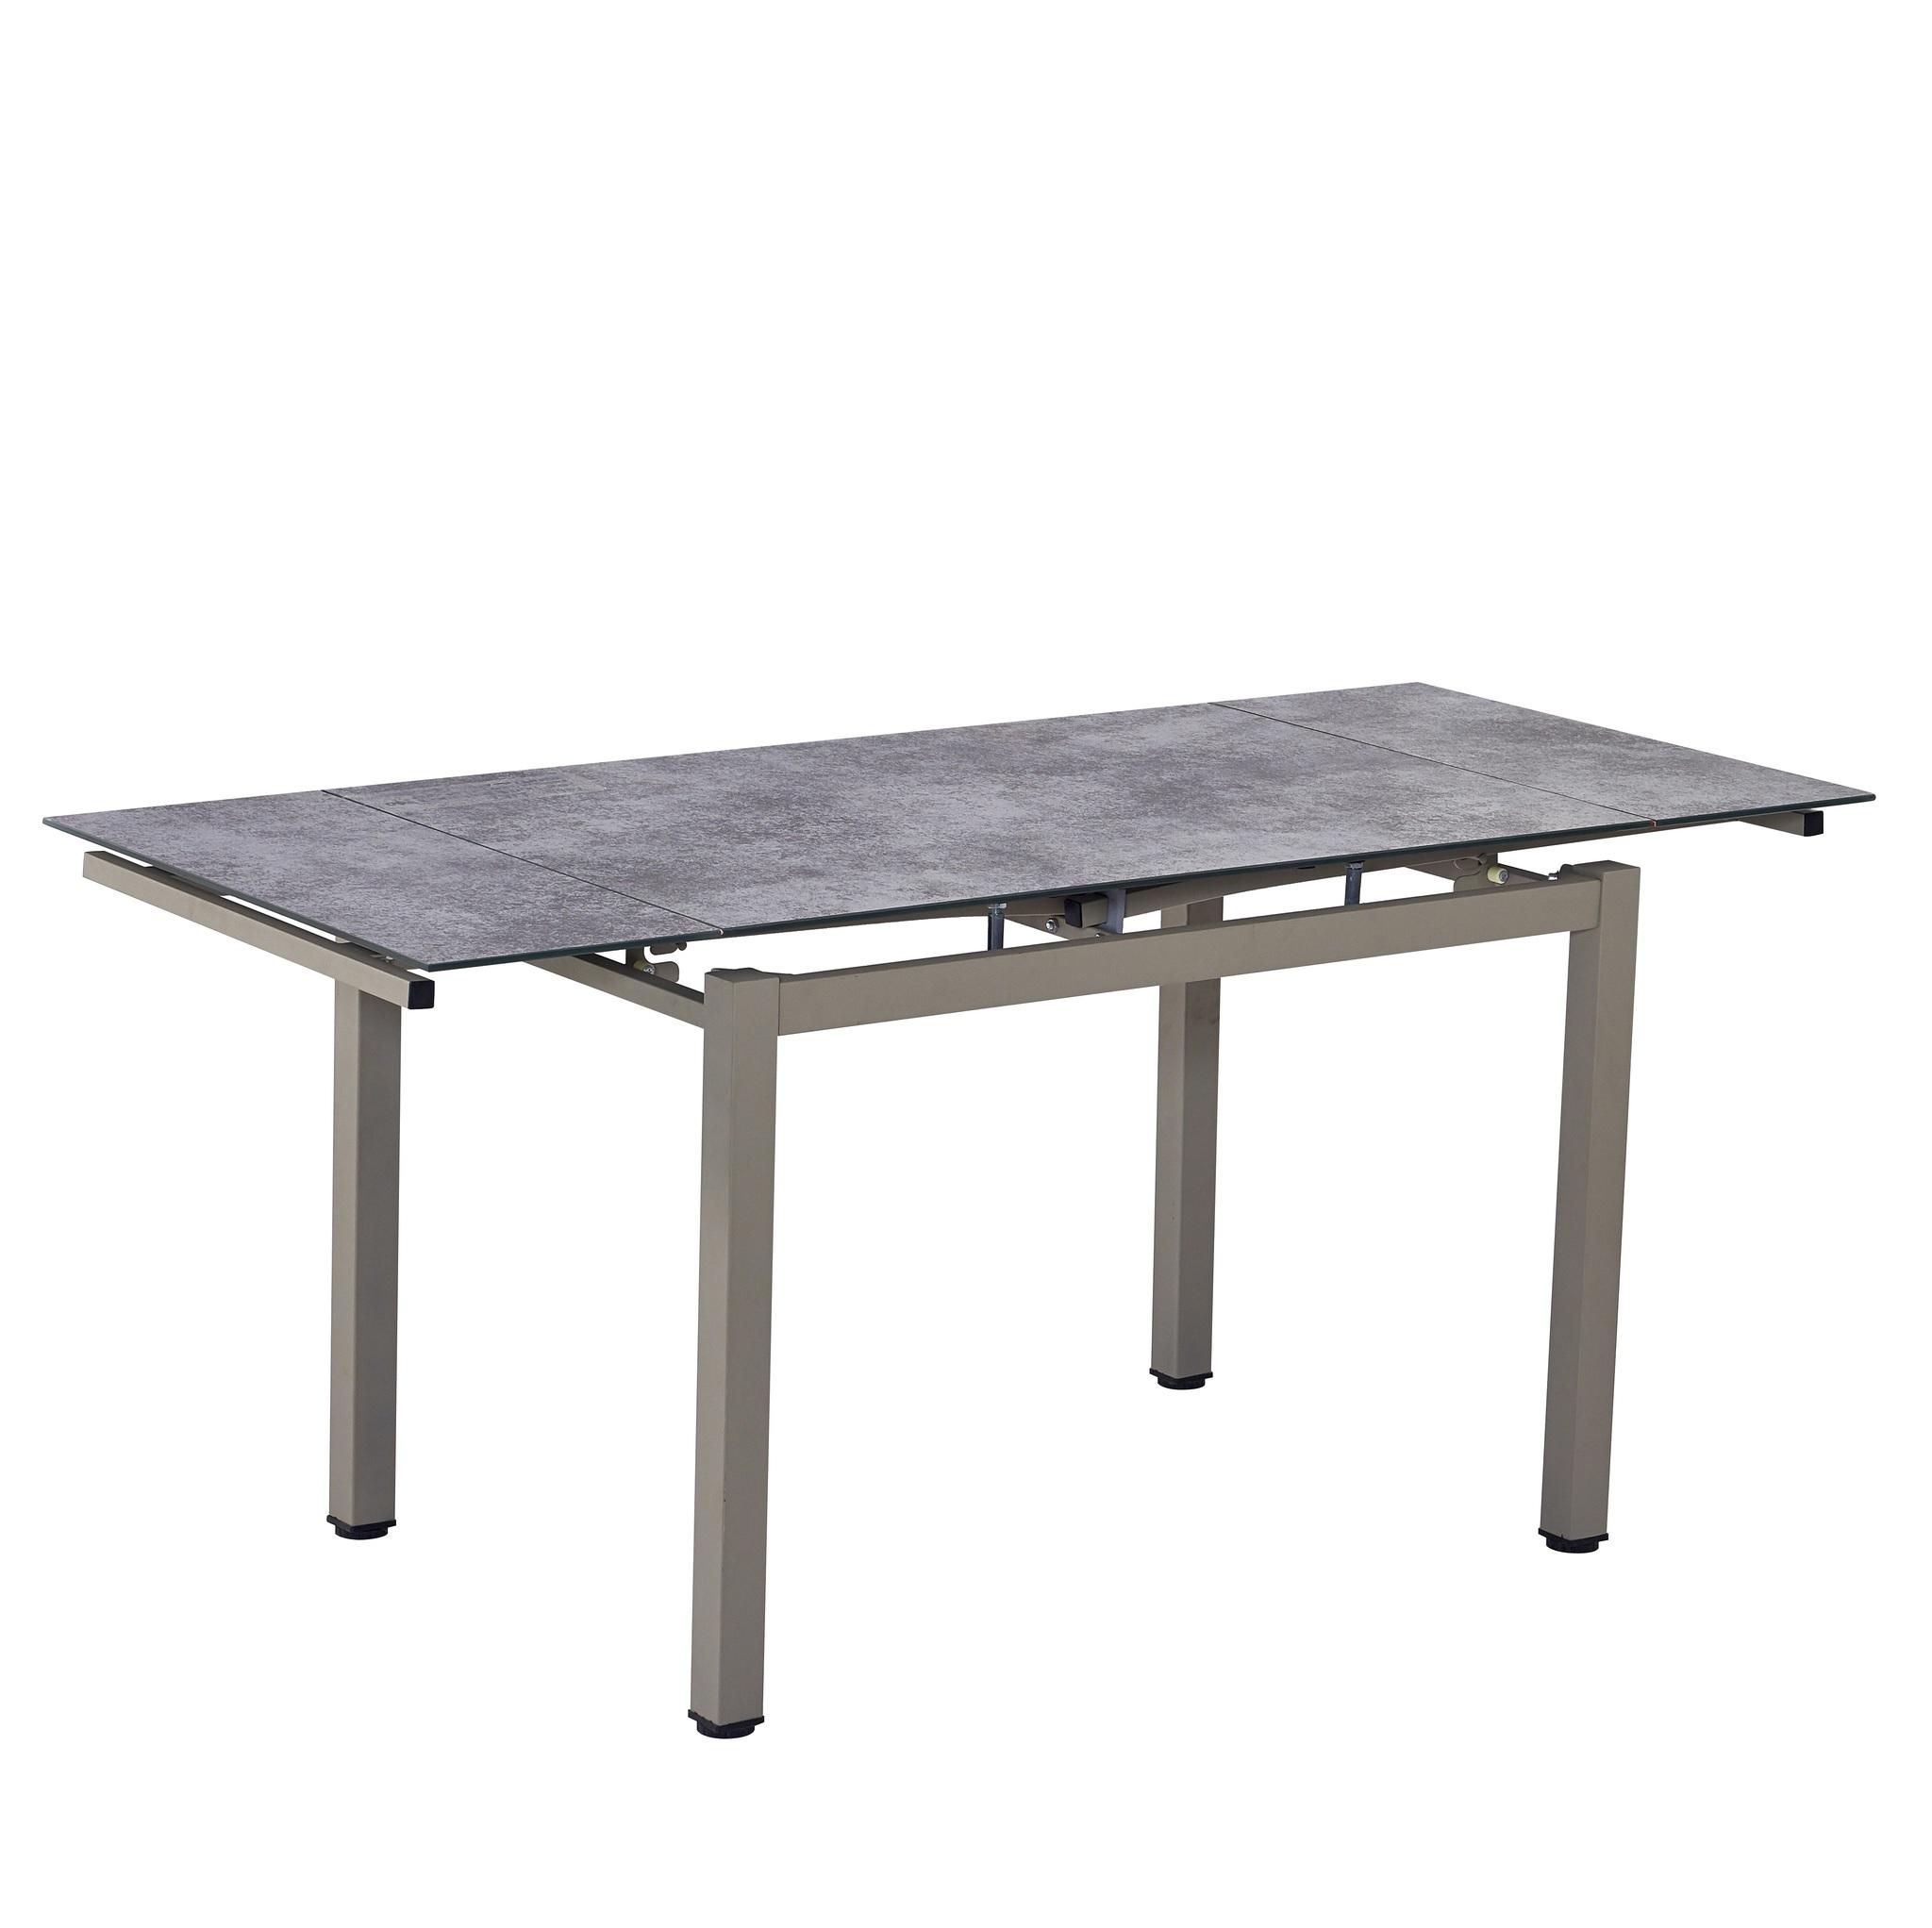 Стол обеденный LIKE-2 (110) BROWN/LATTE (коричневый/латте)